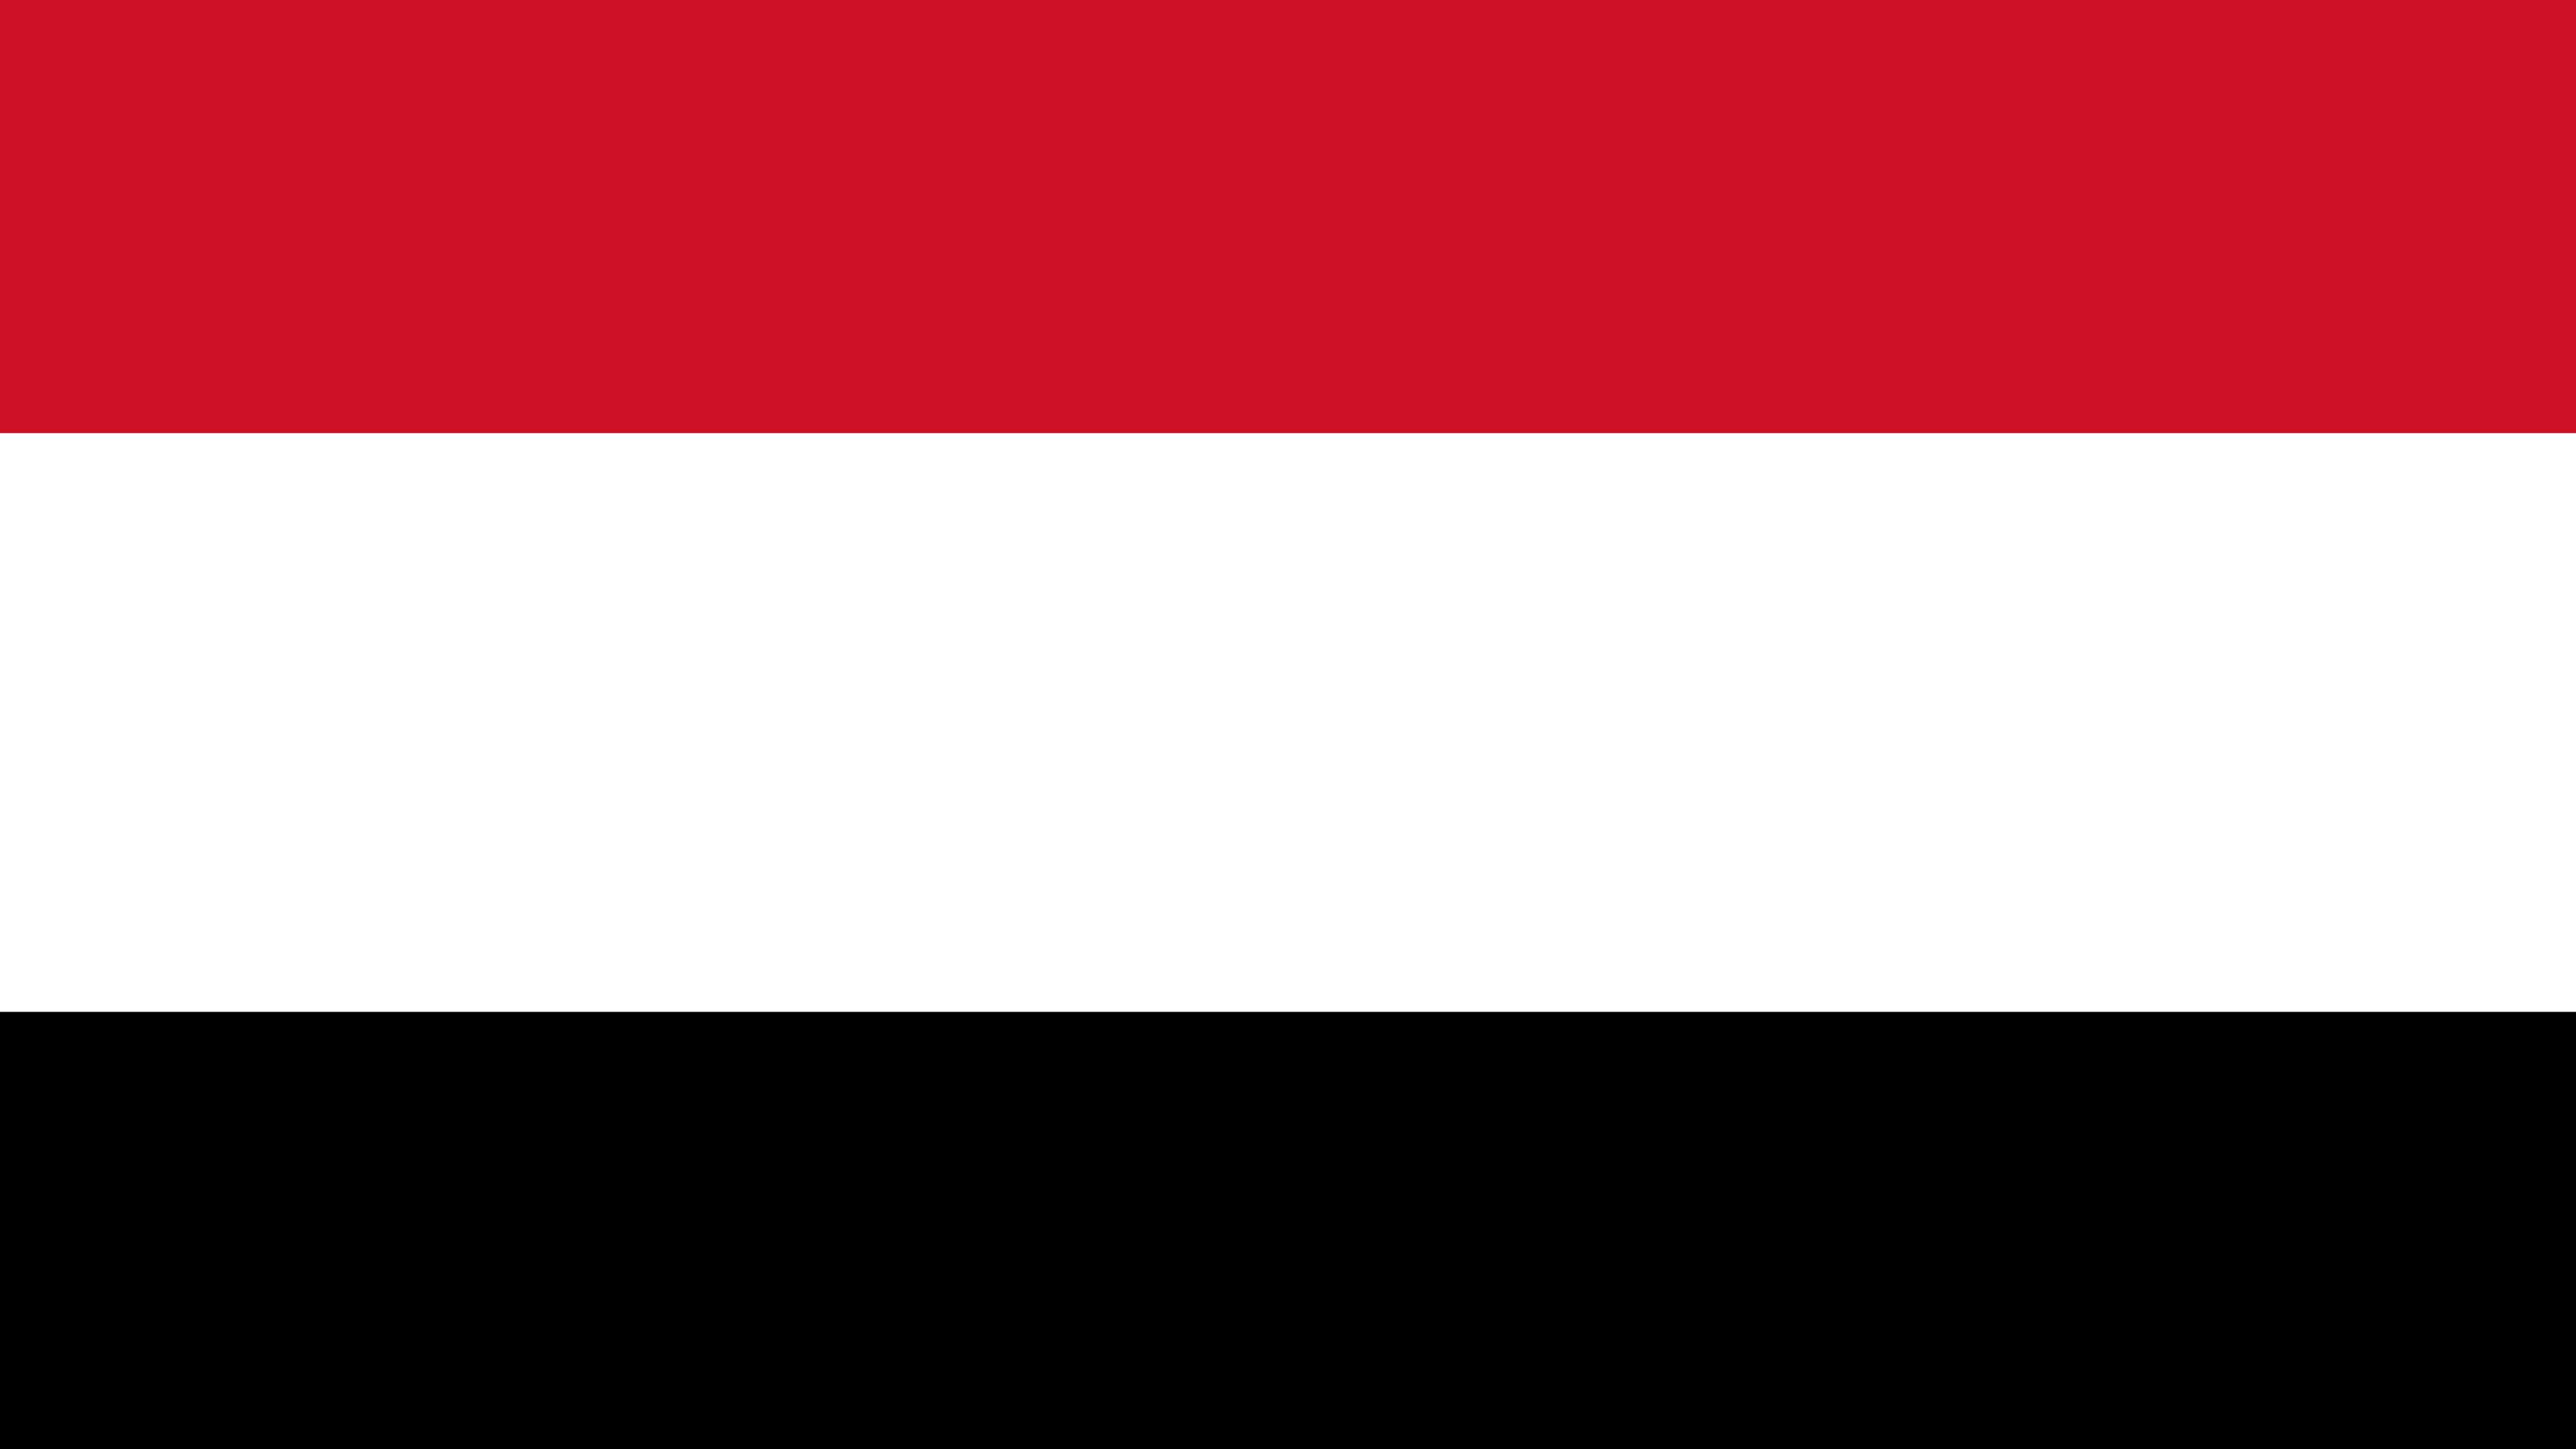 Yemen Flag UHD 4K Wallpaper Pixelz 3840x2160